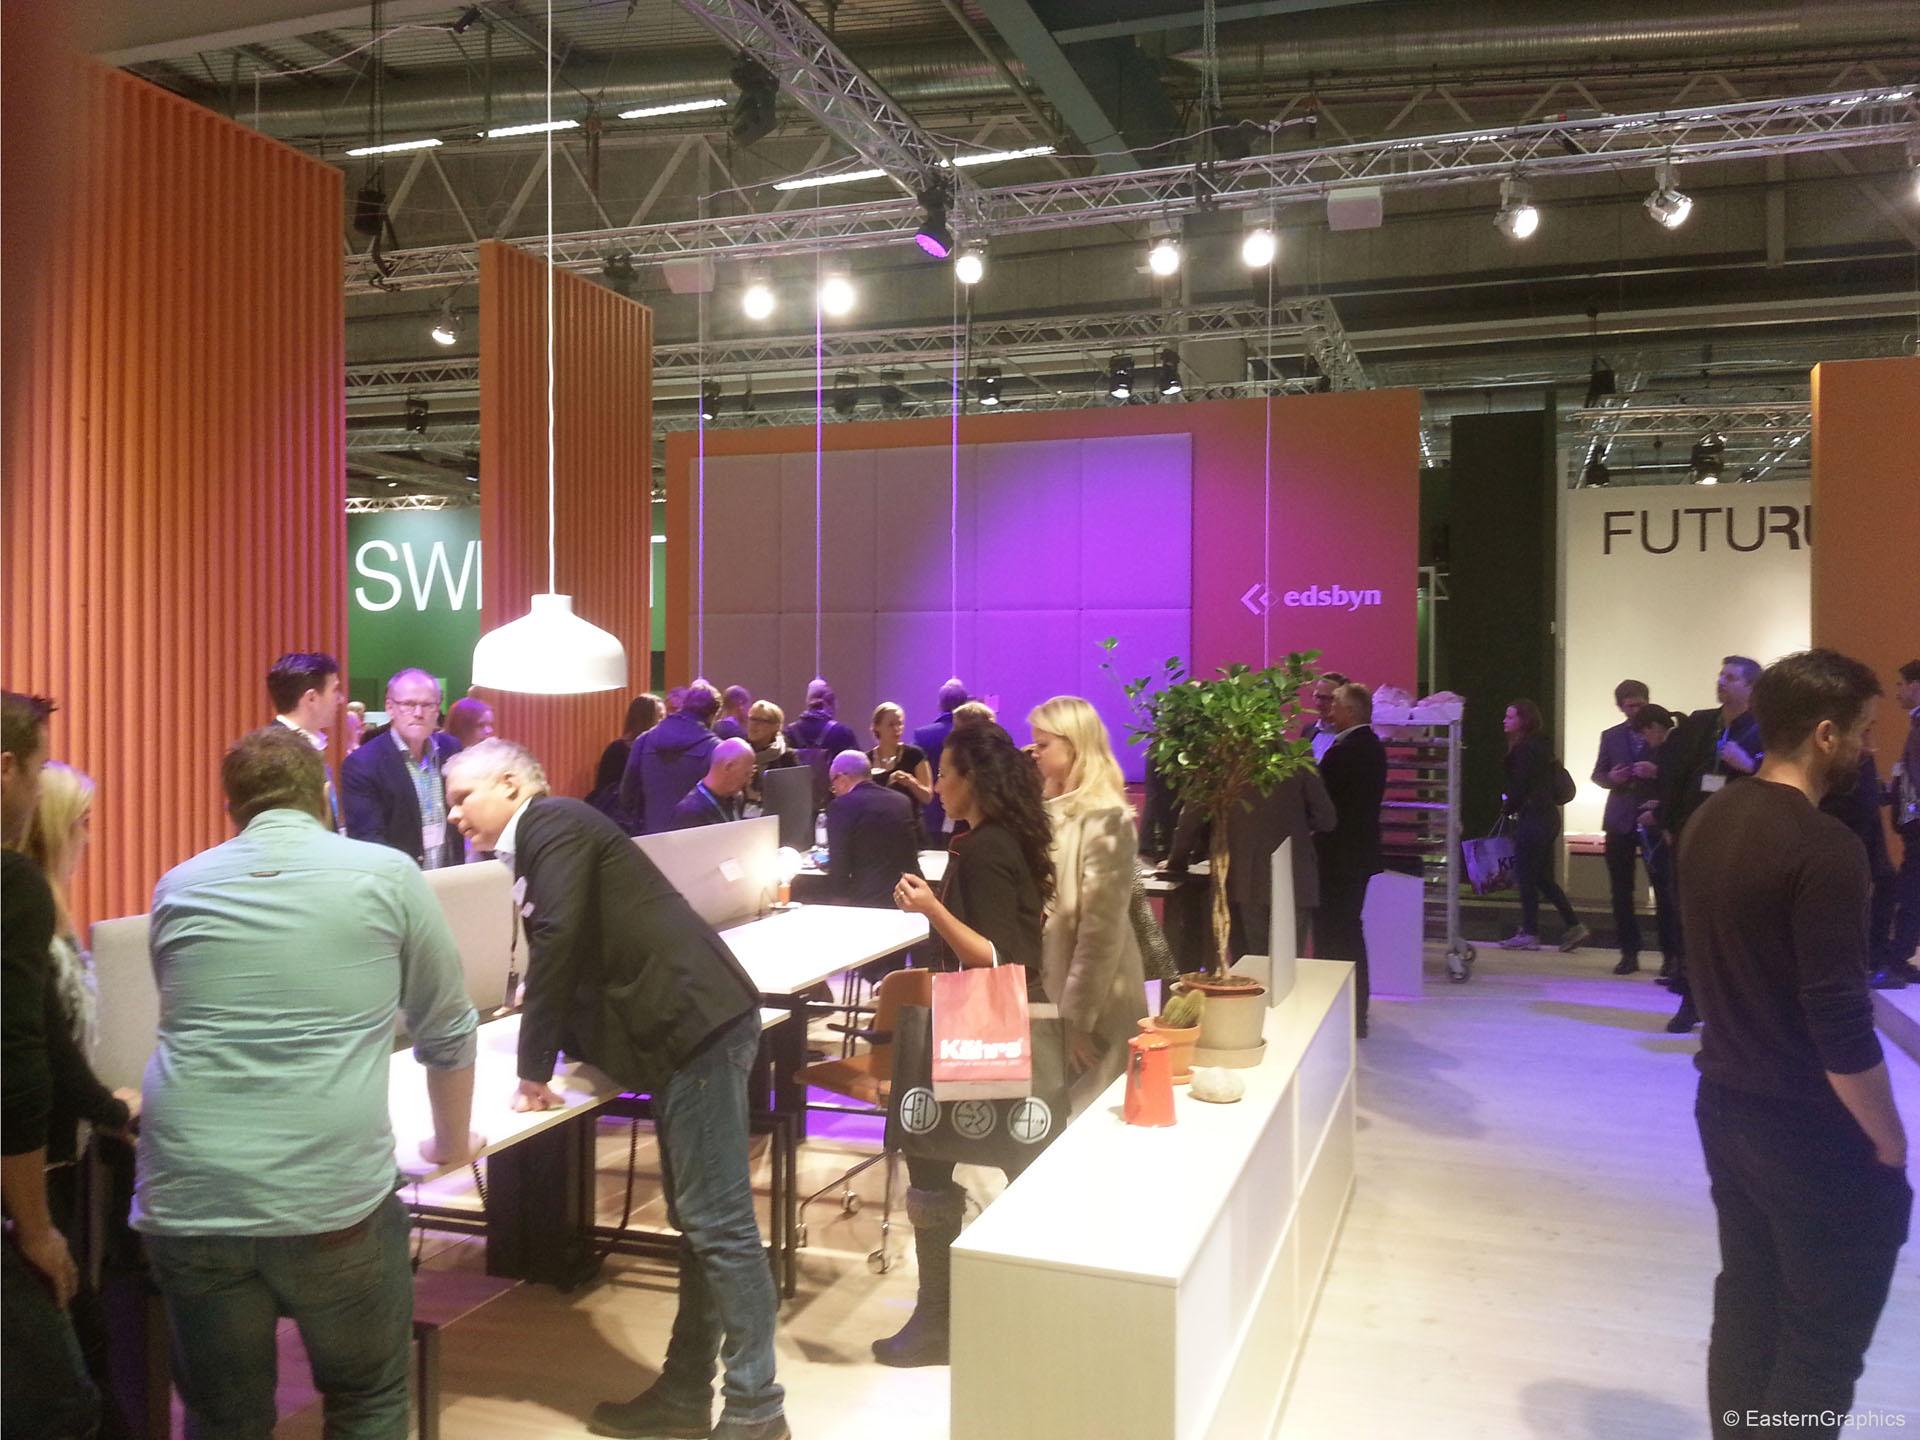 Eindrücke der Stockholm Furniture & Light Fair 2015 - Edsbyn